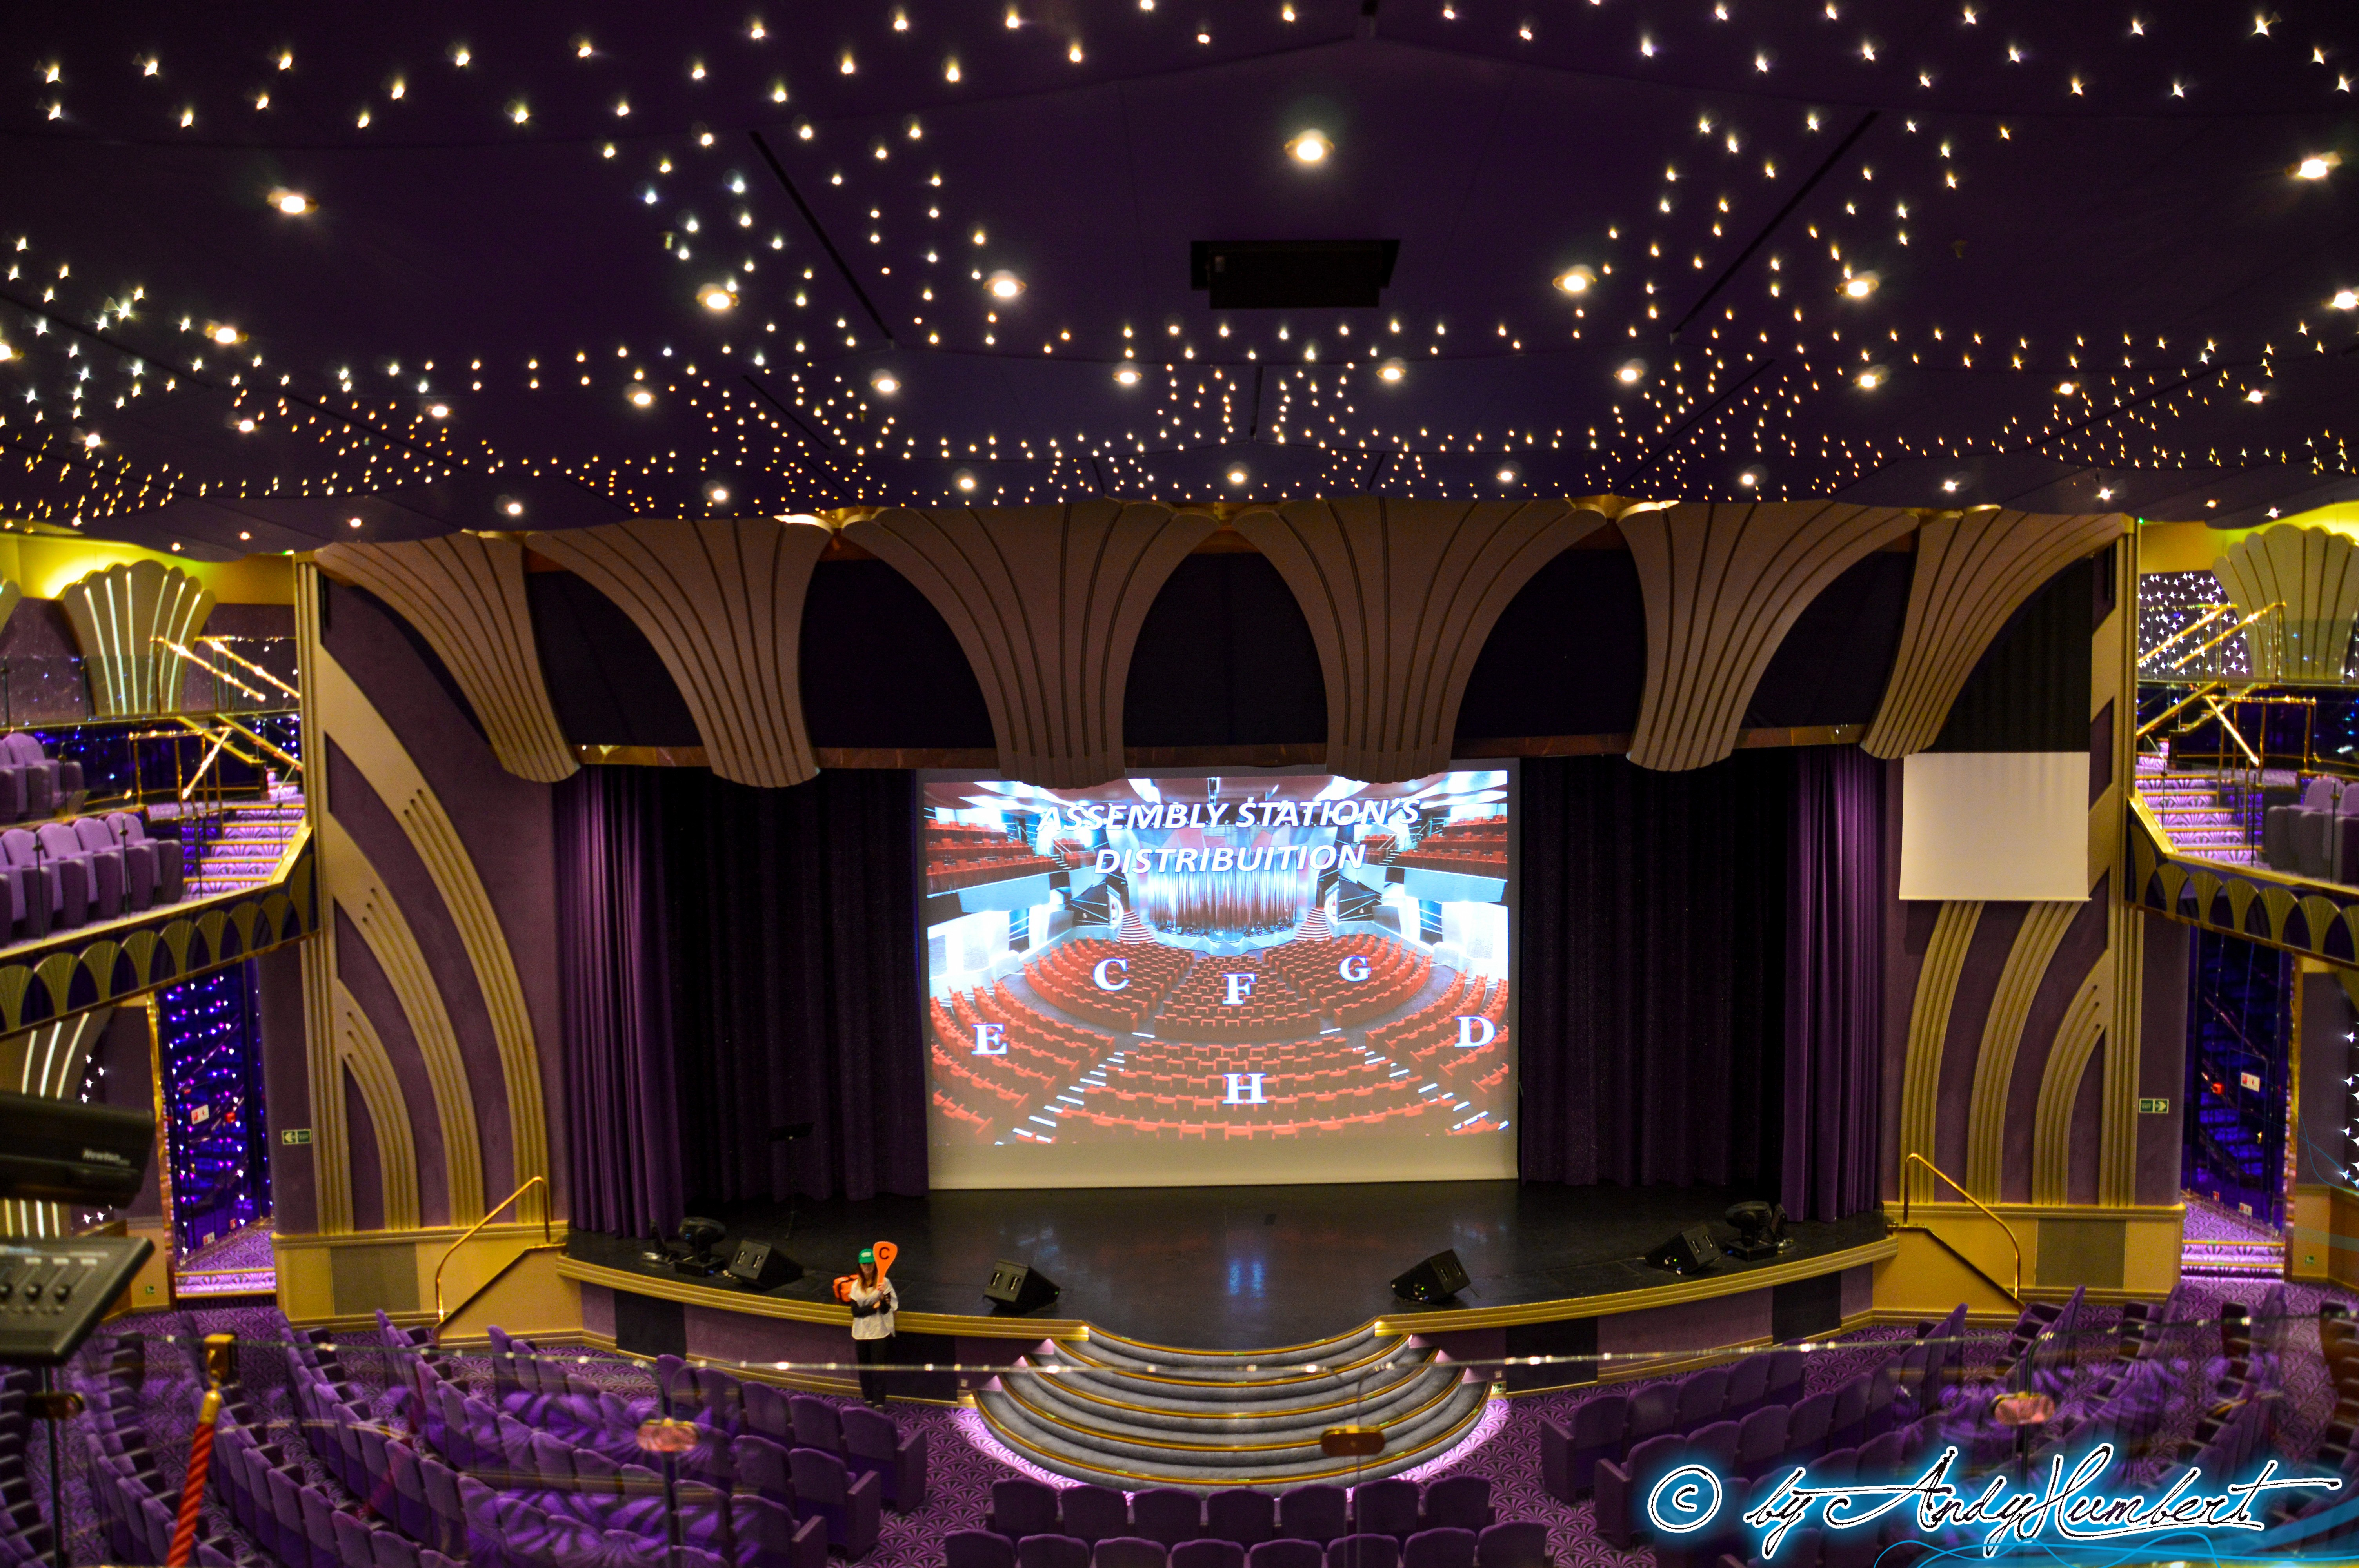 Teatro Carlo Felice (ponts 5 à 7)